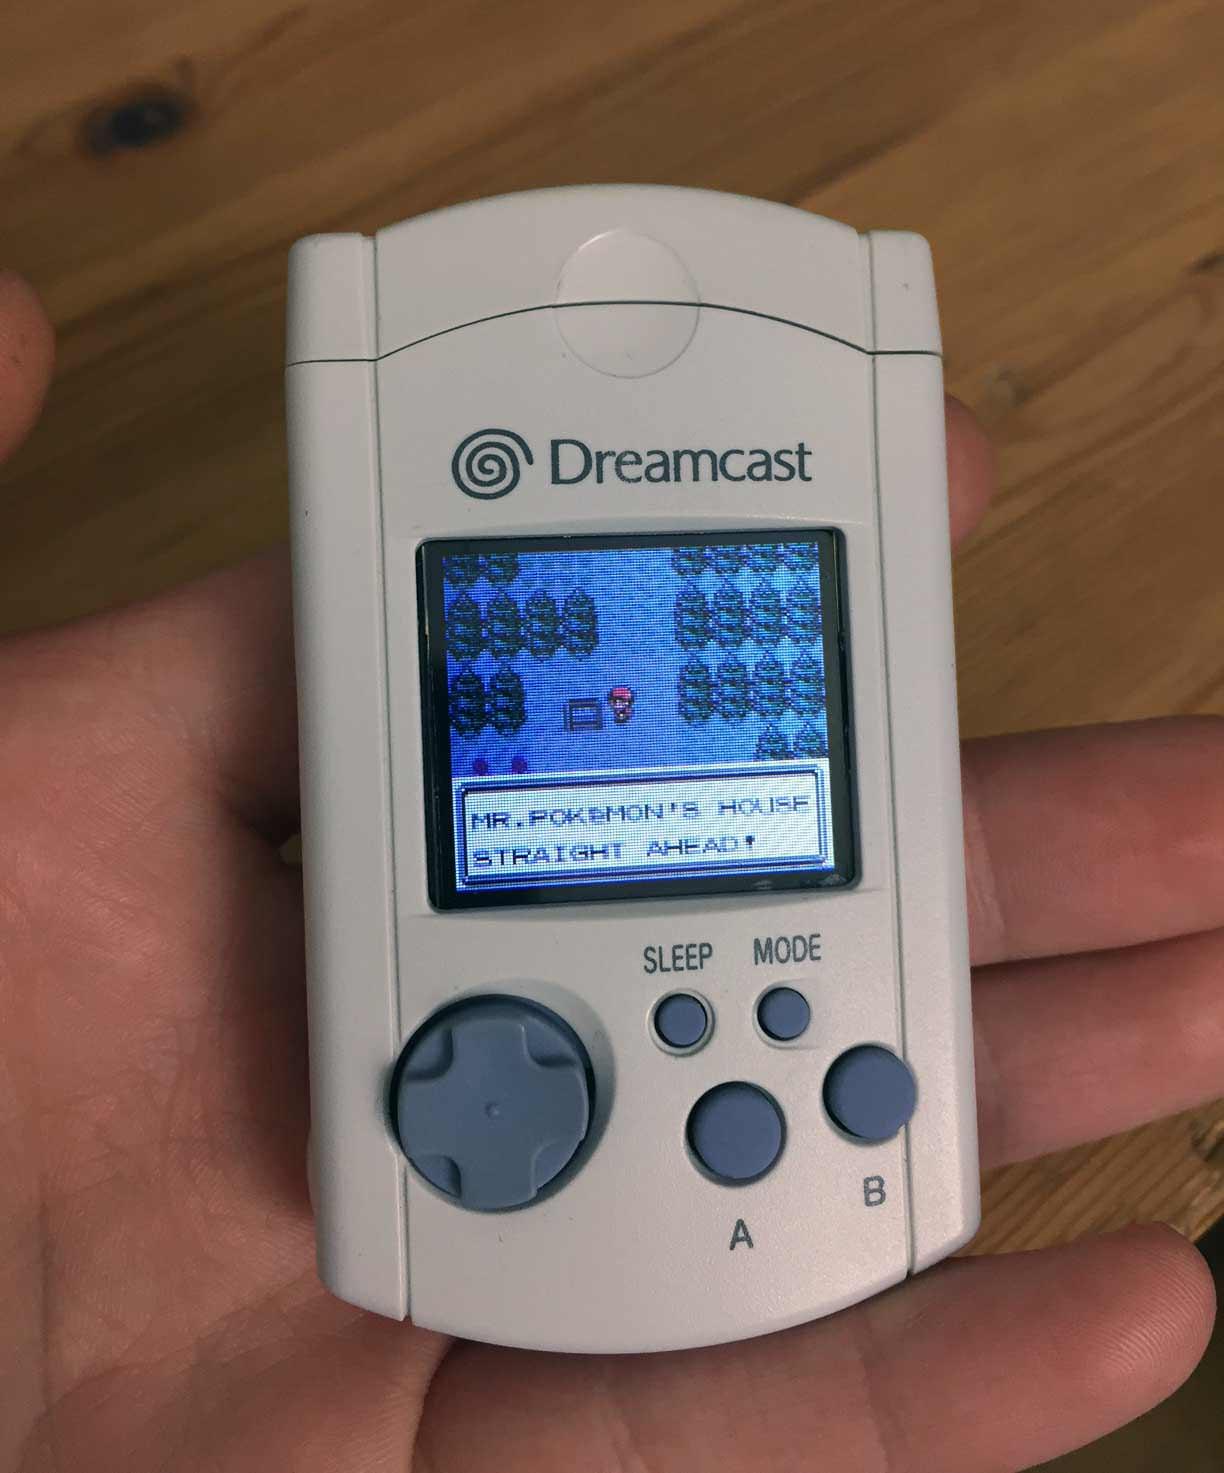 Modifican VMU de Dreamcast para correr Pokémon Gold & Silver | LevelUp